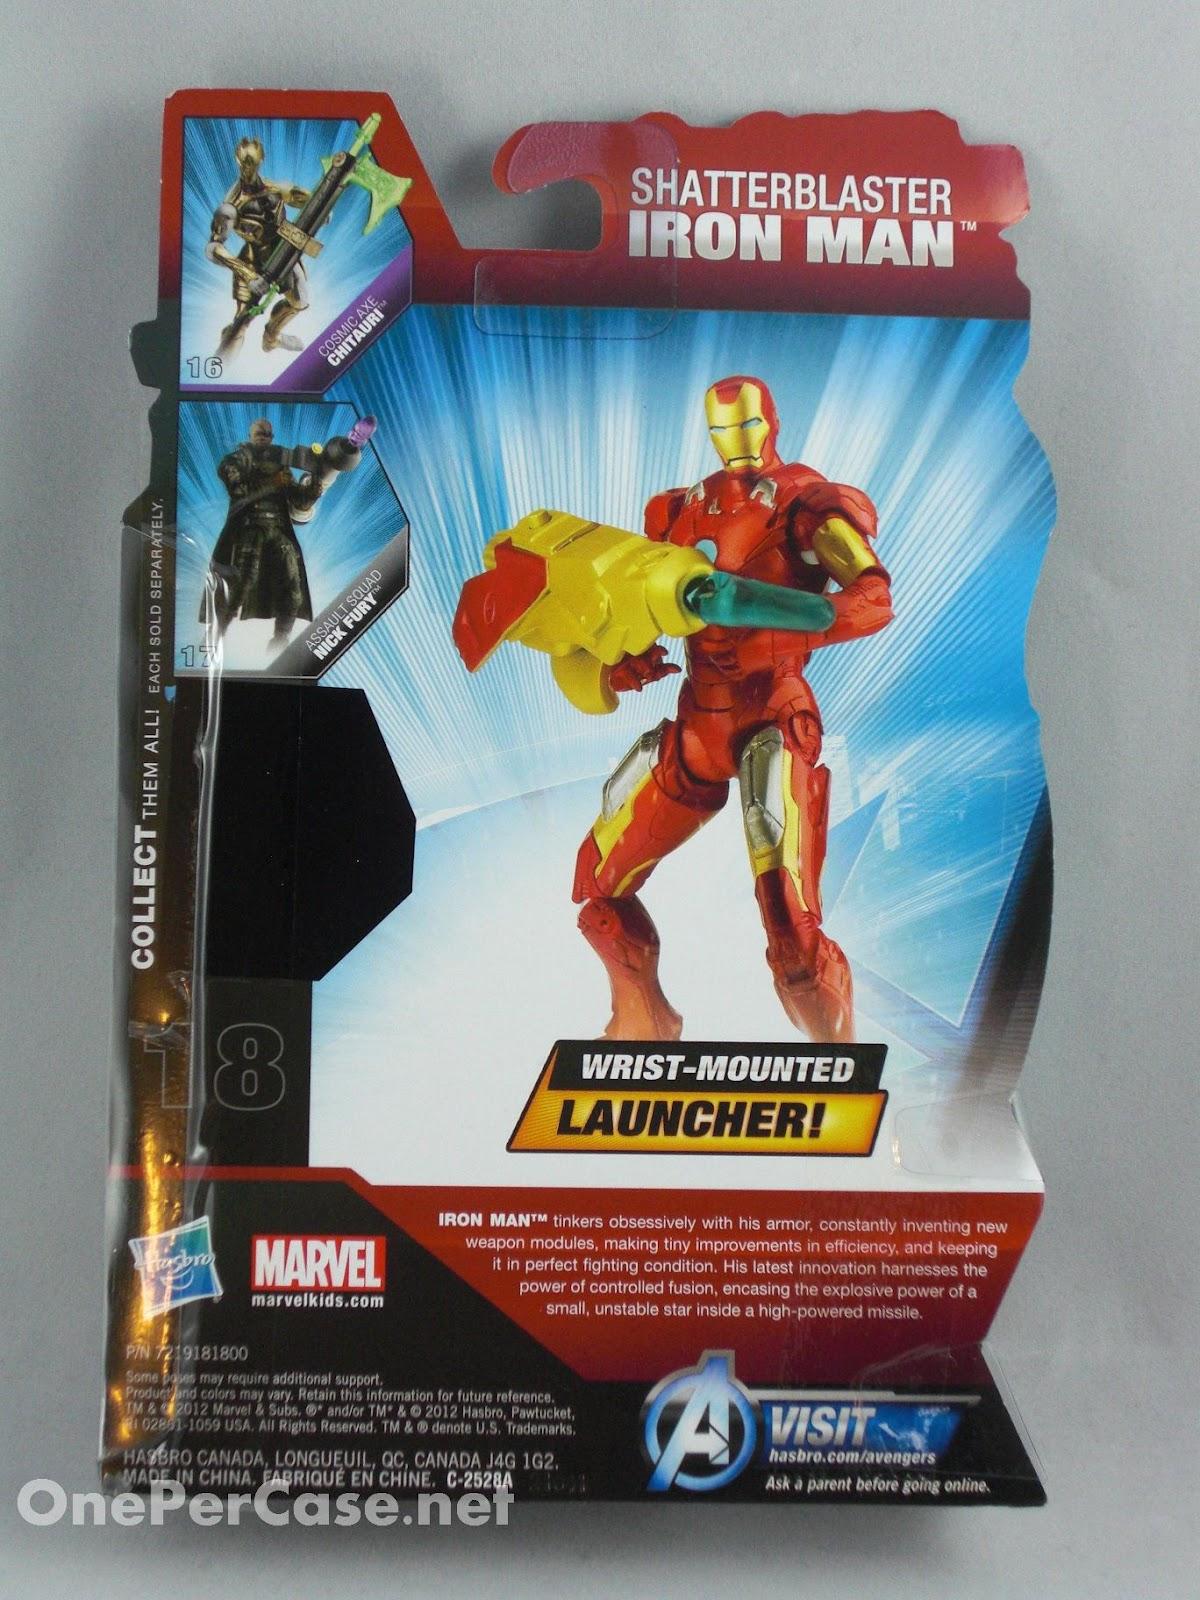 http://1.bp.blogspot.com/-hJD-bmLJLVA/UDb9vfM_yRI/AAAAAAAAFZg/hb_uZe1wOPg/s1600/Hasbro+Marvel+Universe+The+Avengers+Shatter+Blaster+Iron+Man+Mark+VII+